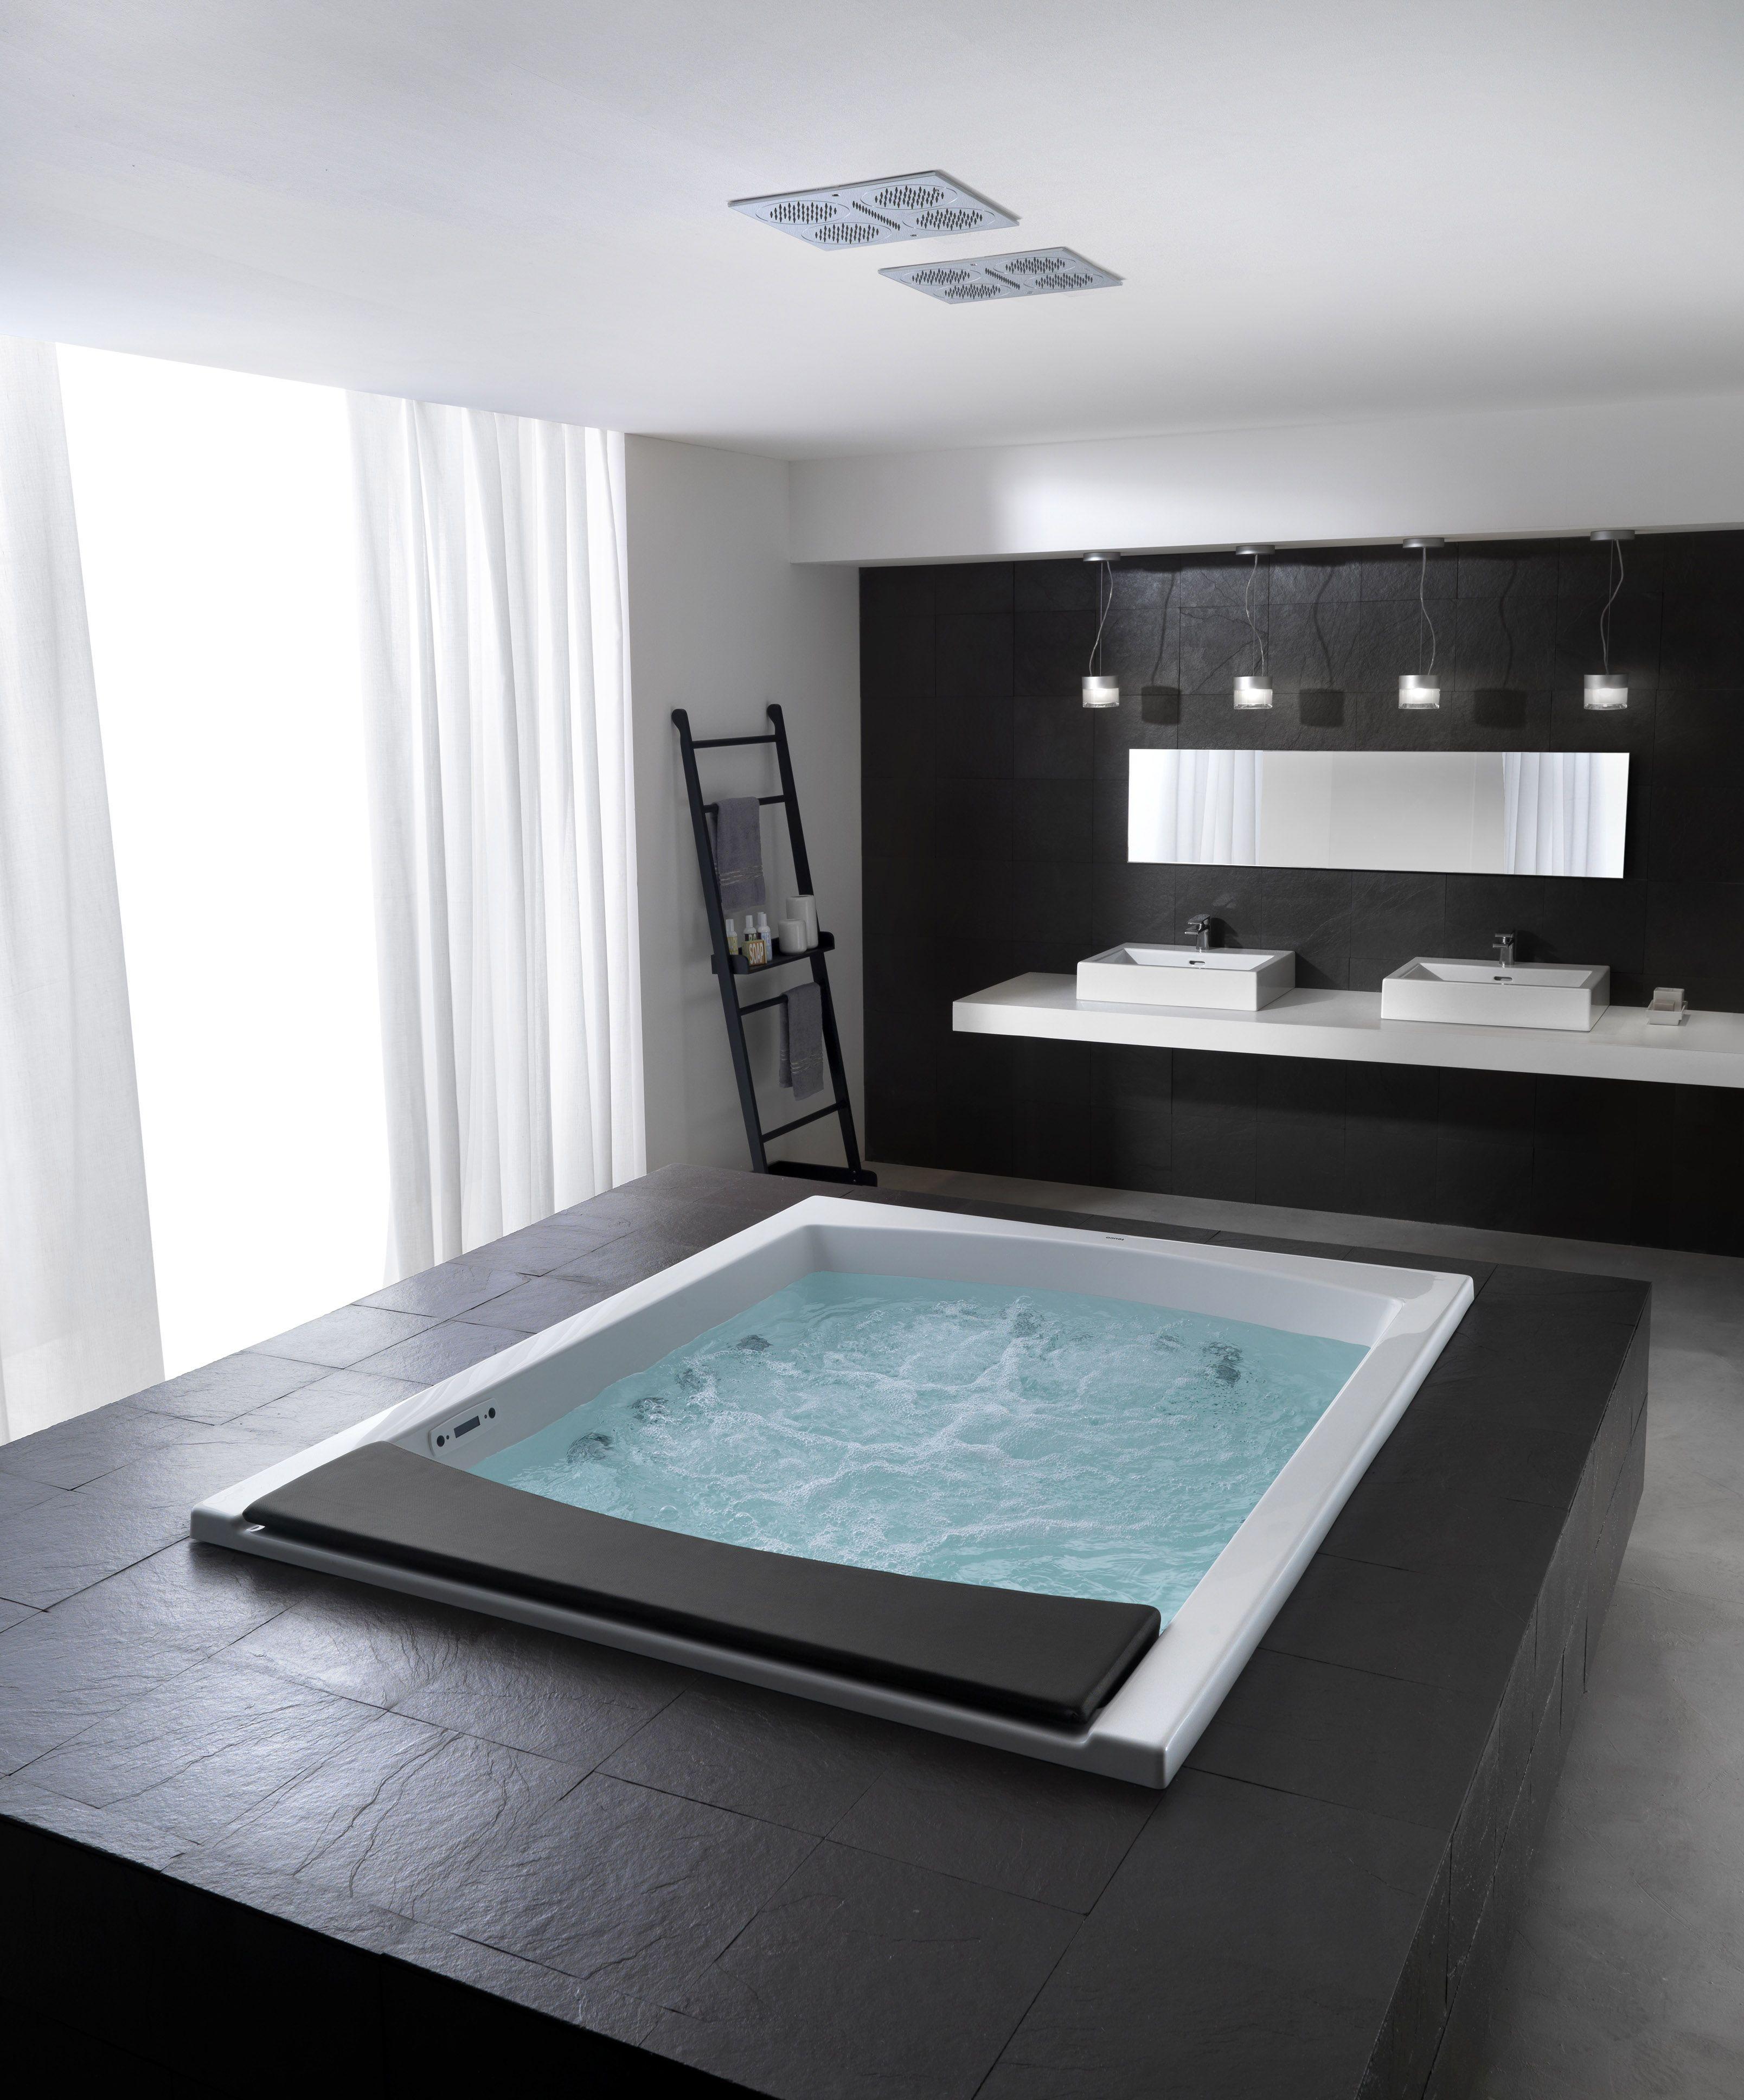 Einmal Traumbad, bitte! | °home° | Amazing bathrooms ...